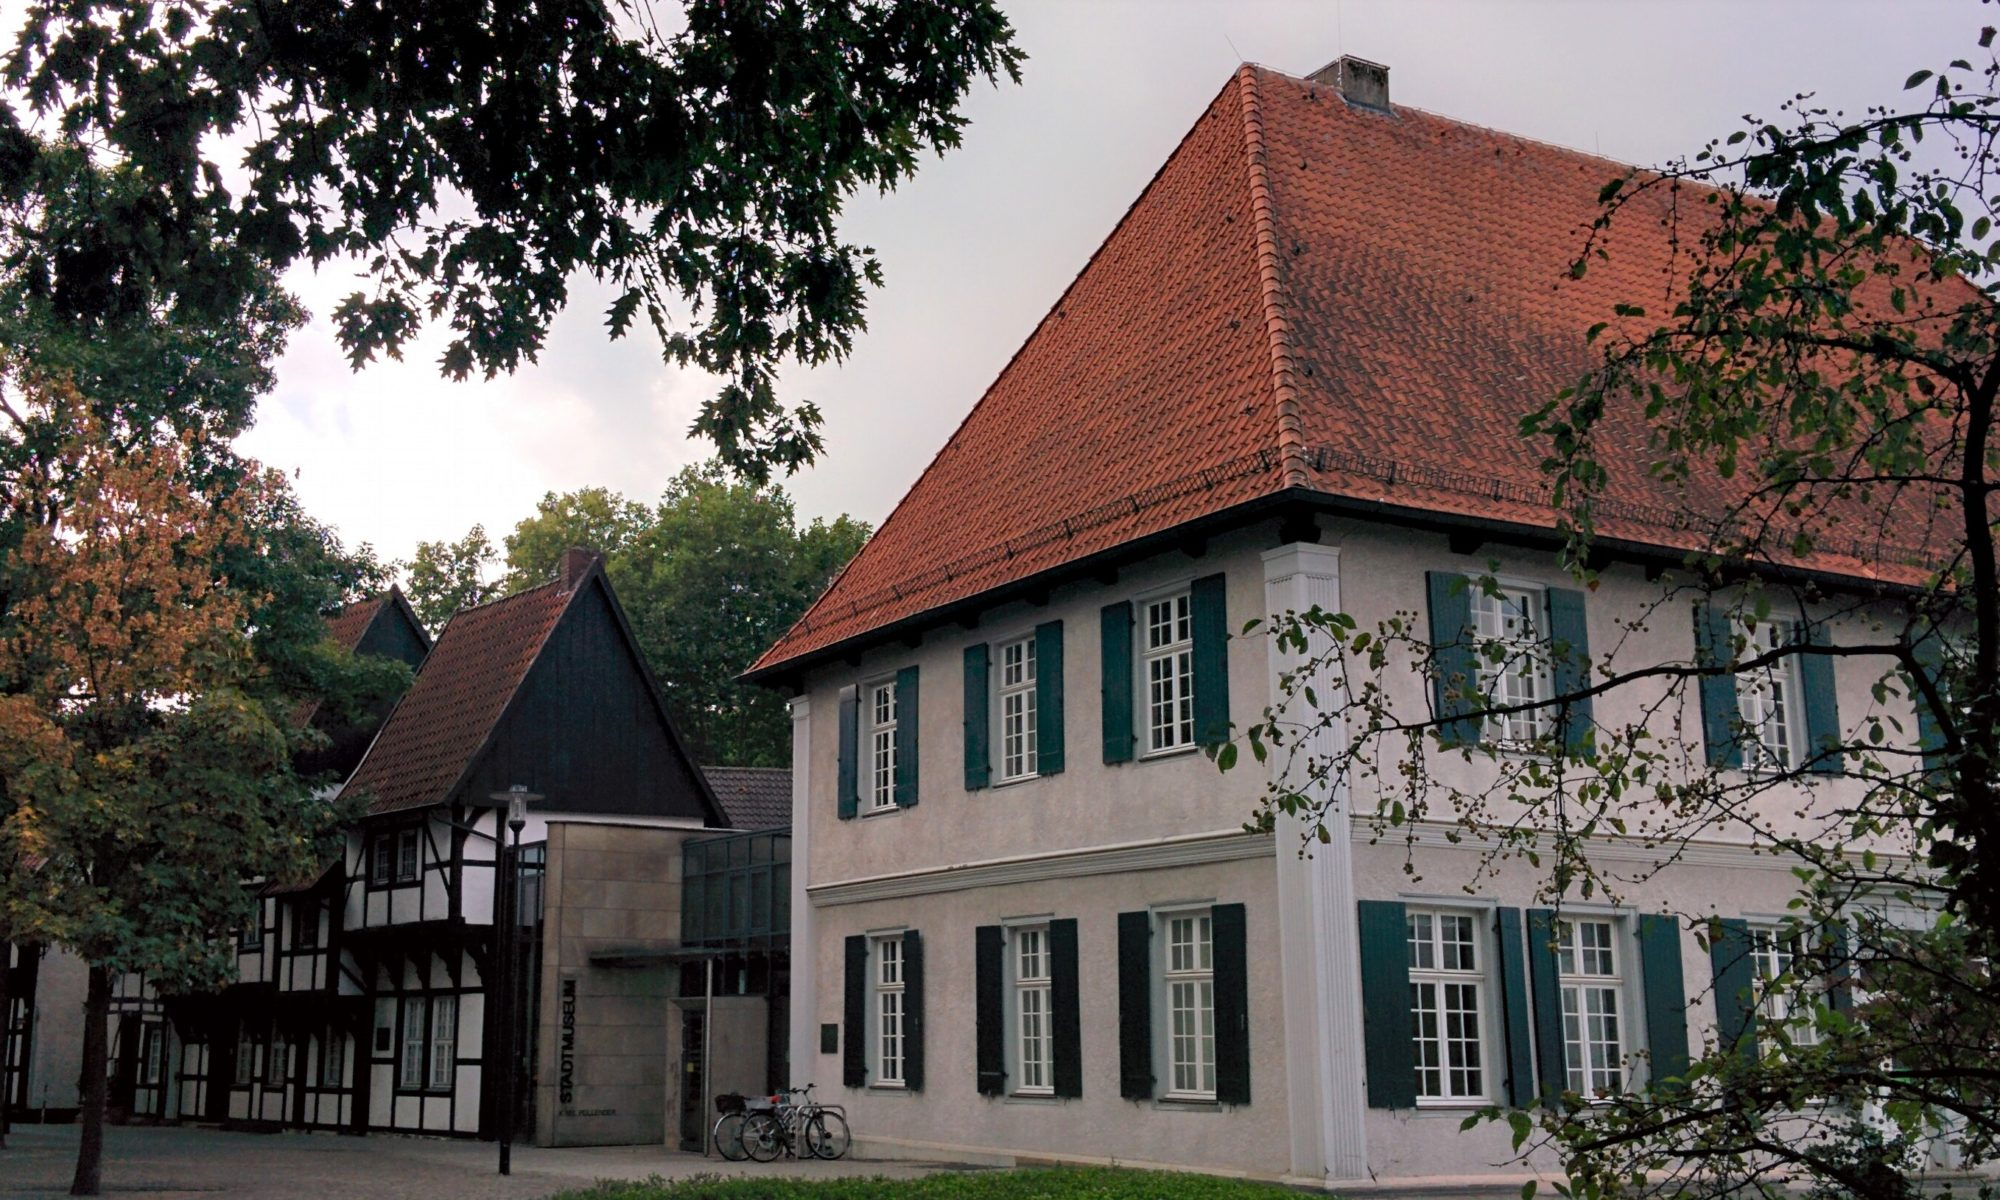 Stadtmuseum Werne